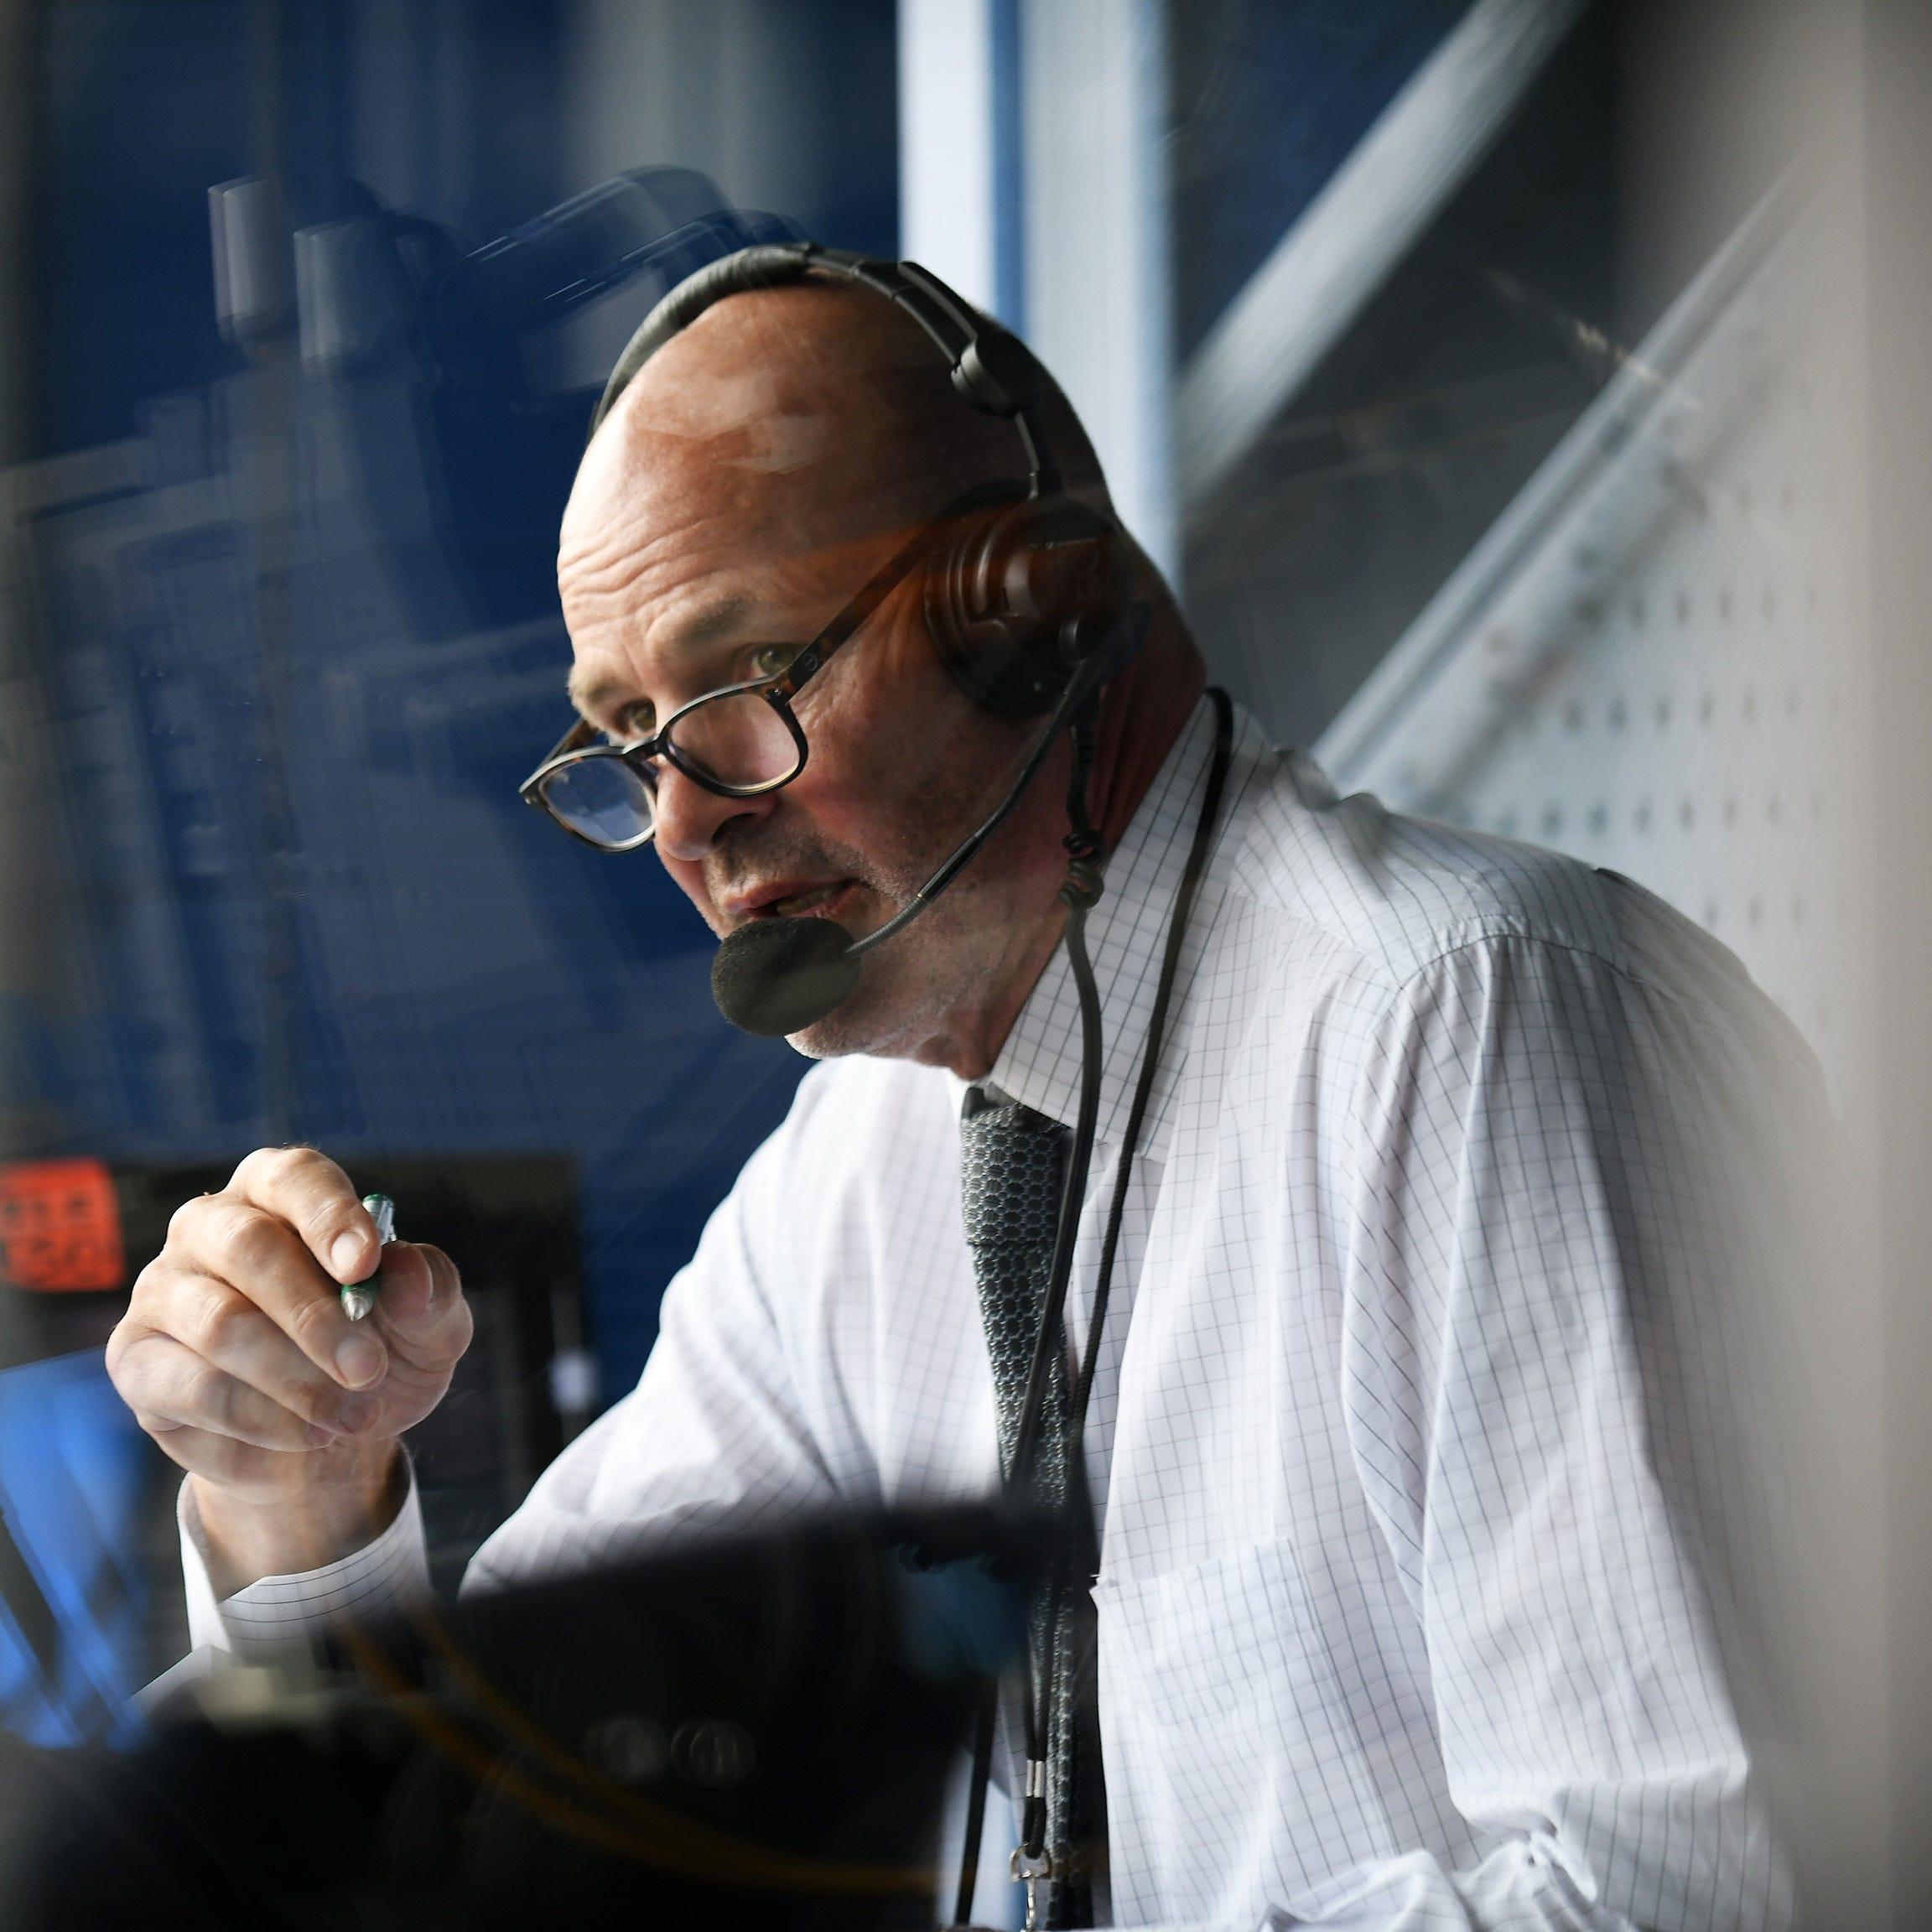 Henning: Former Tigers, MSU great Kirk Gibson still dazzles in Grand Rapids